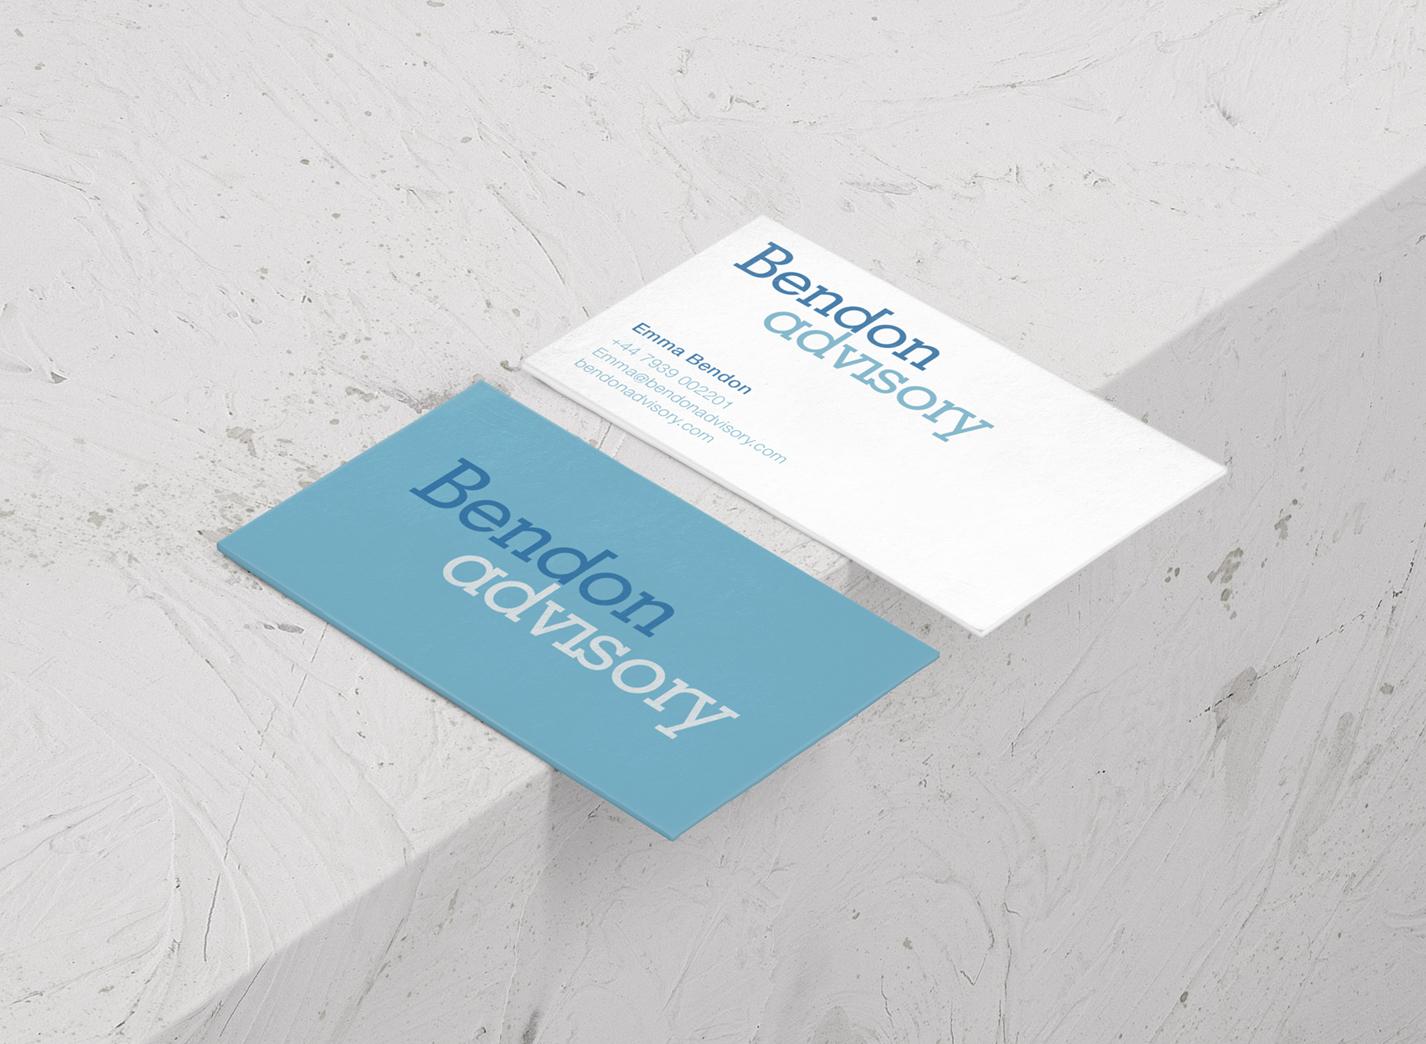 Bendon_advisory